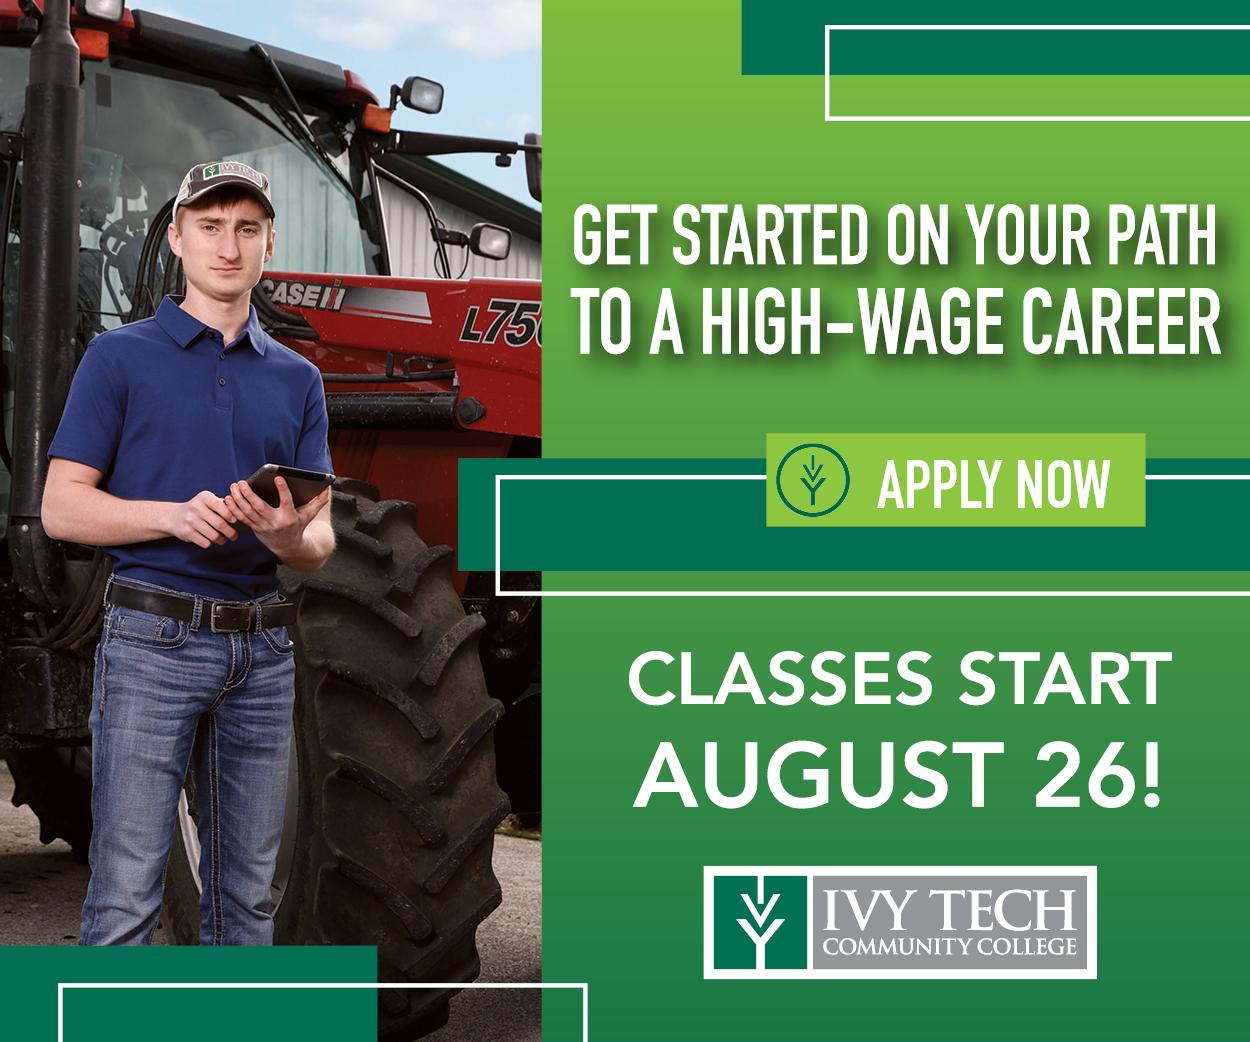 Ivy Tech Community College